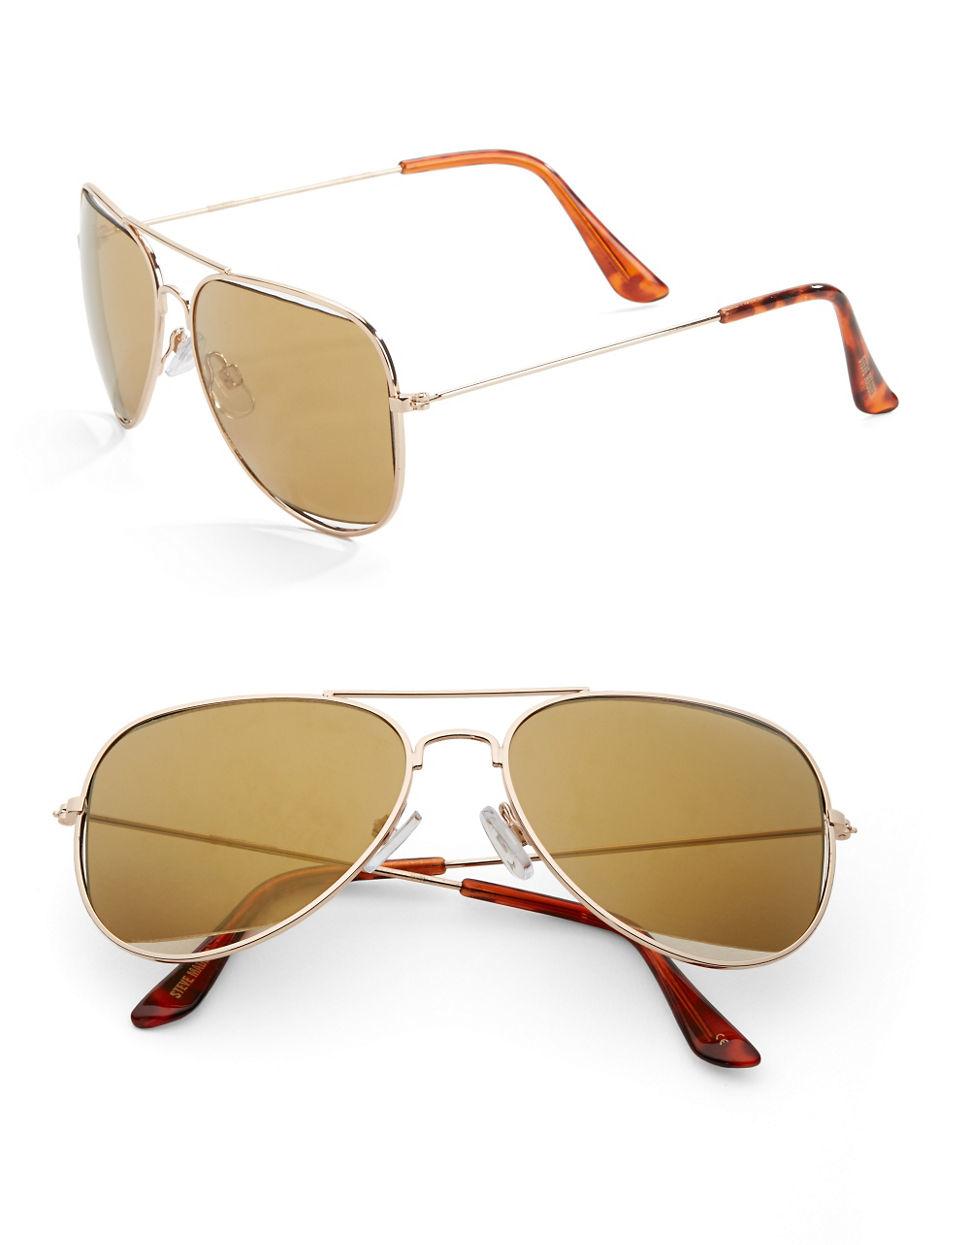 963a39cf0 Lyst - Steve Madden 63mm Aviator Sunglasses in Metallic